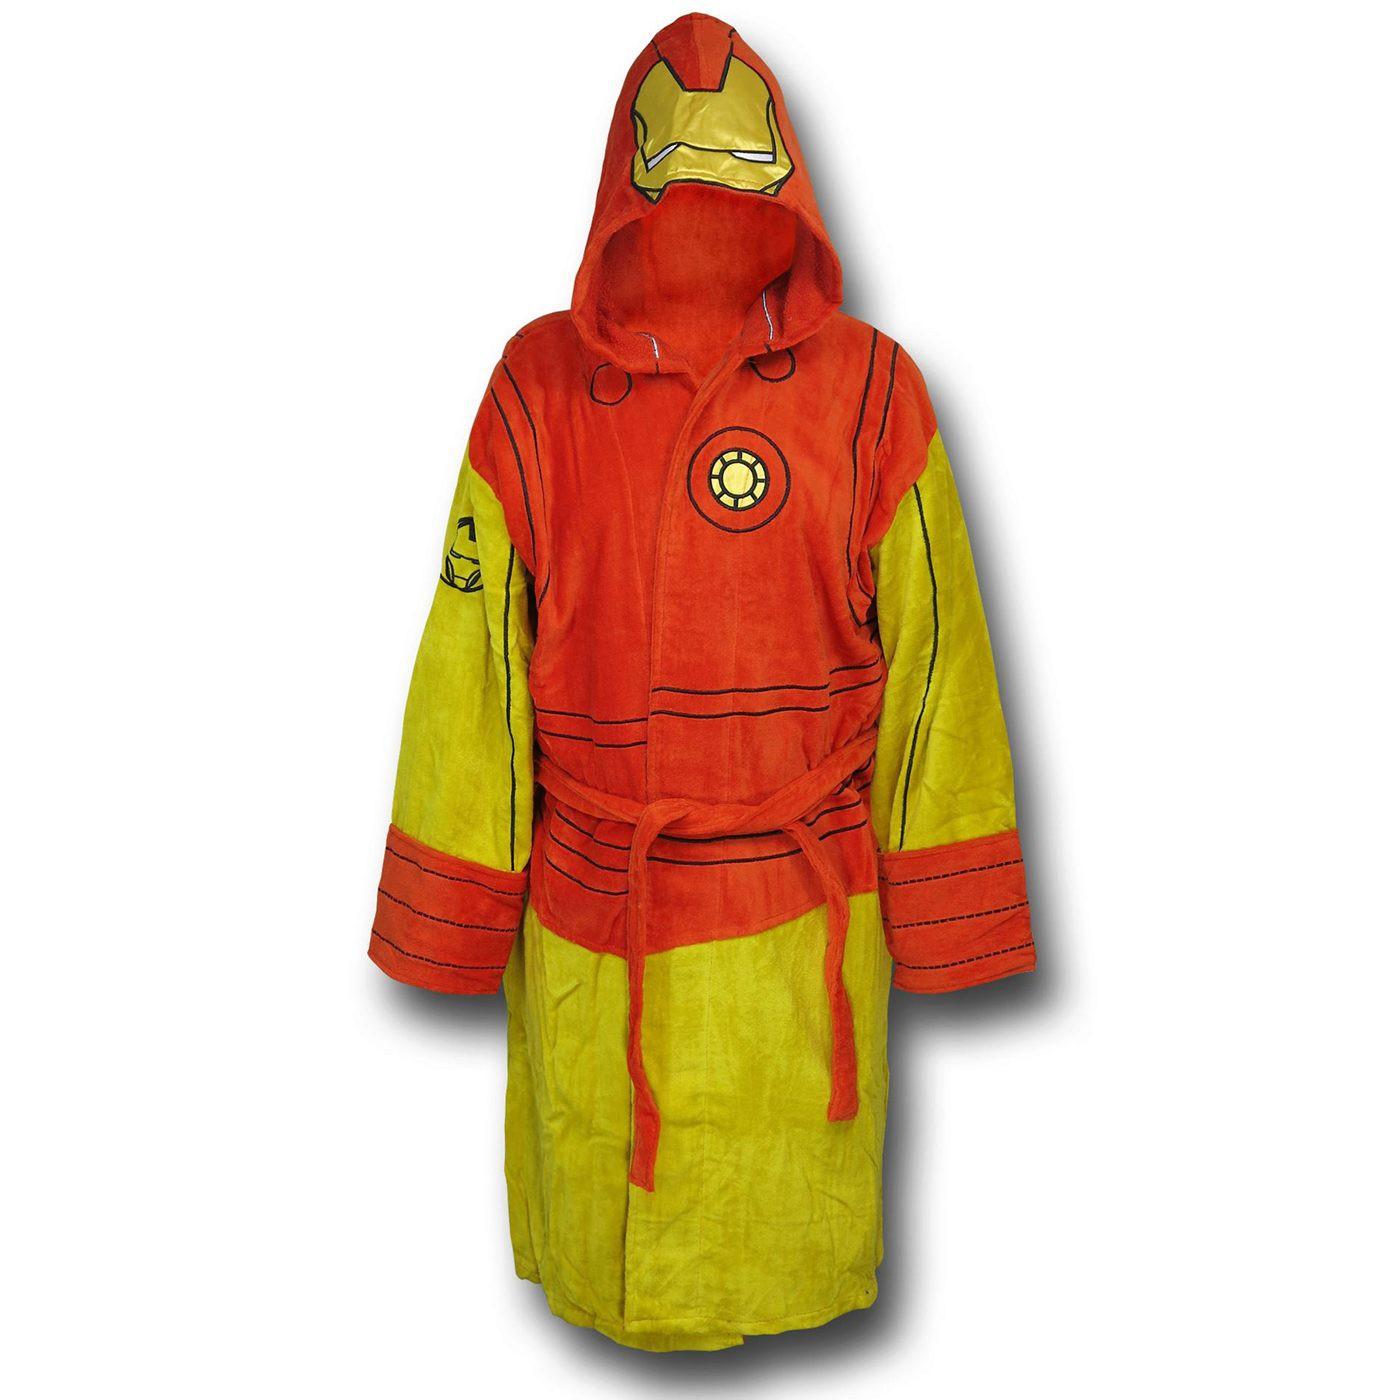 Iron Man Hooded Robe